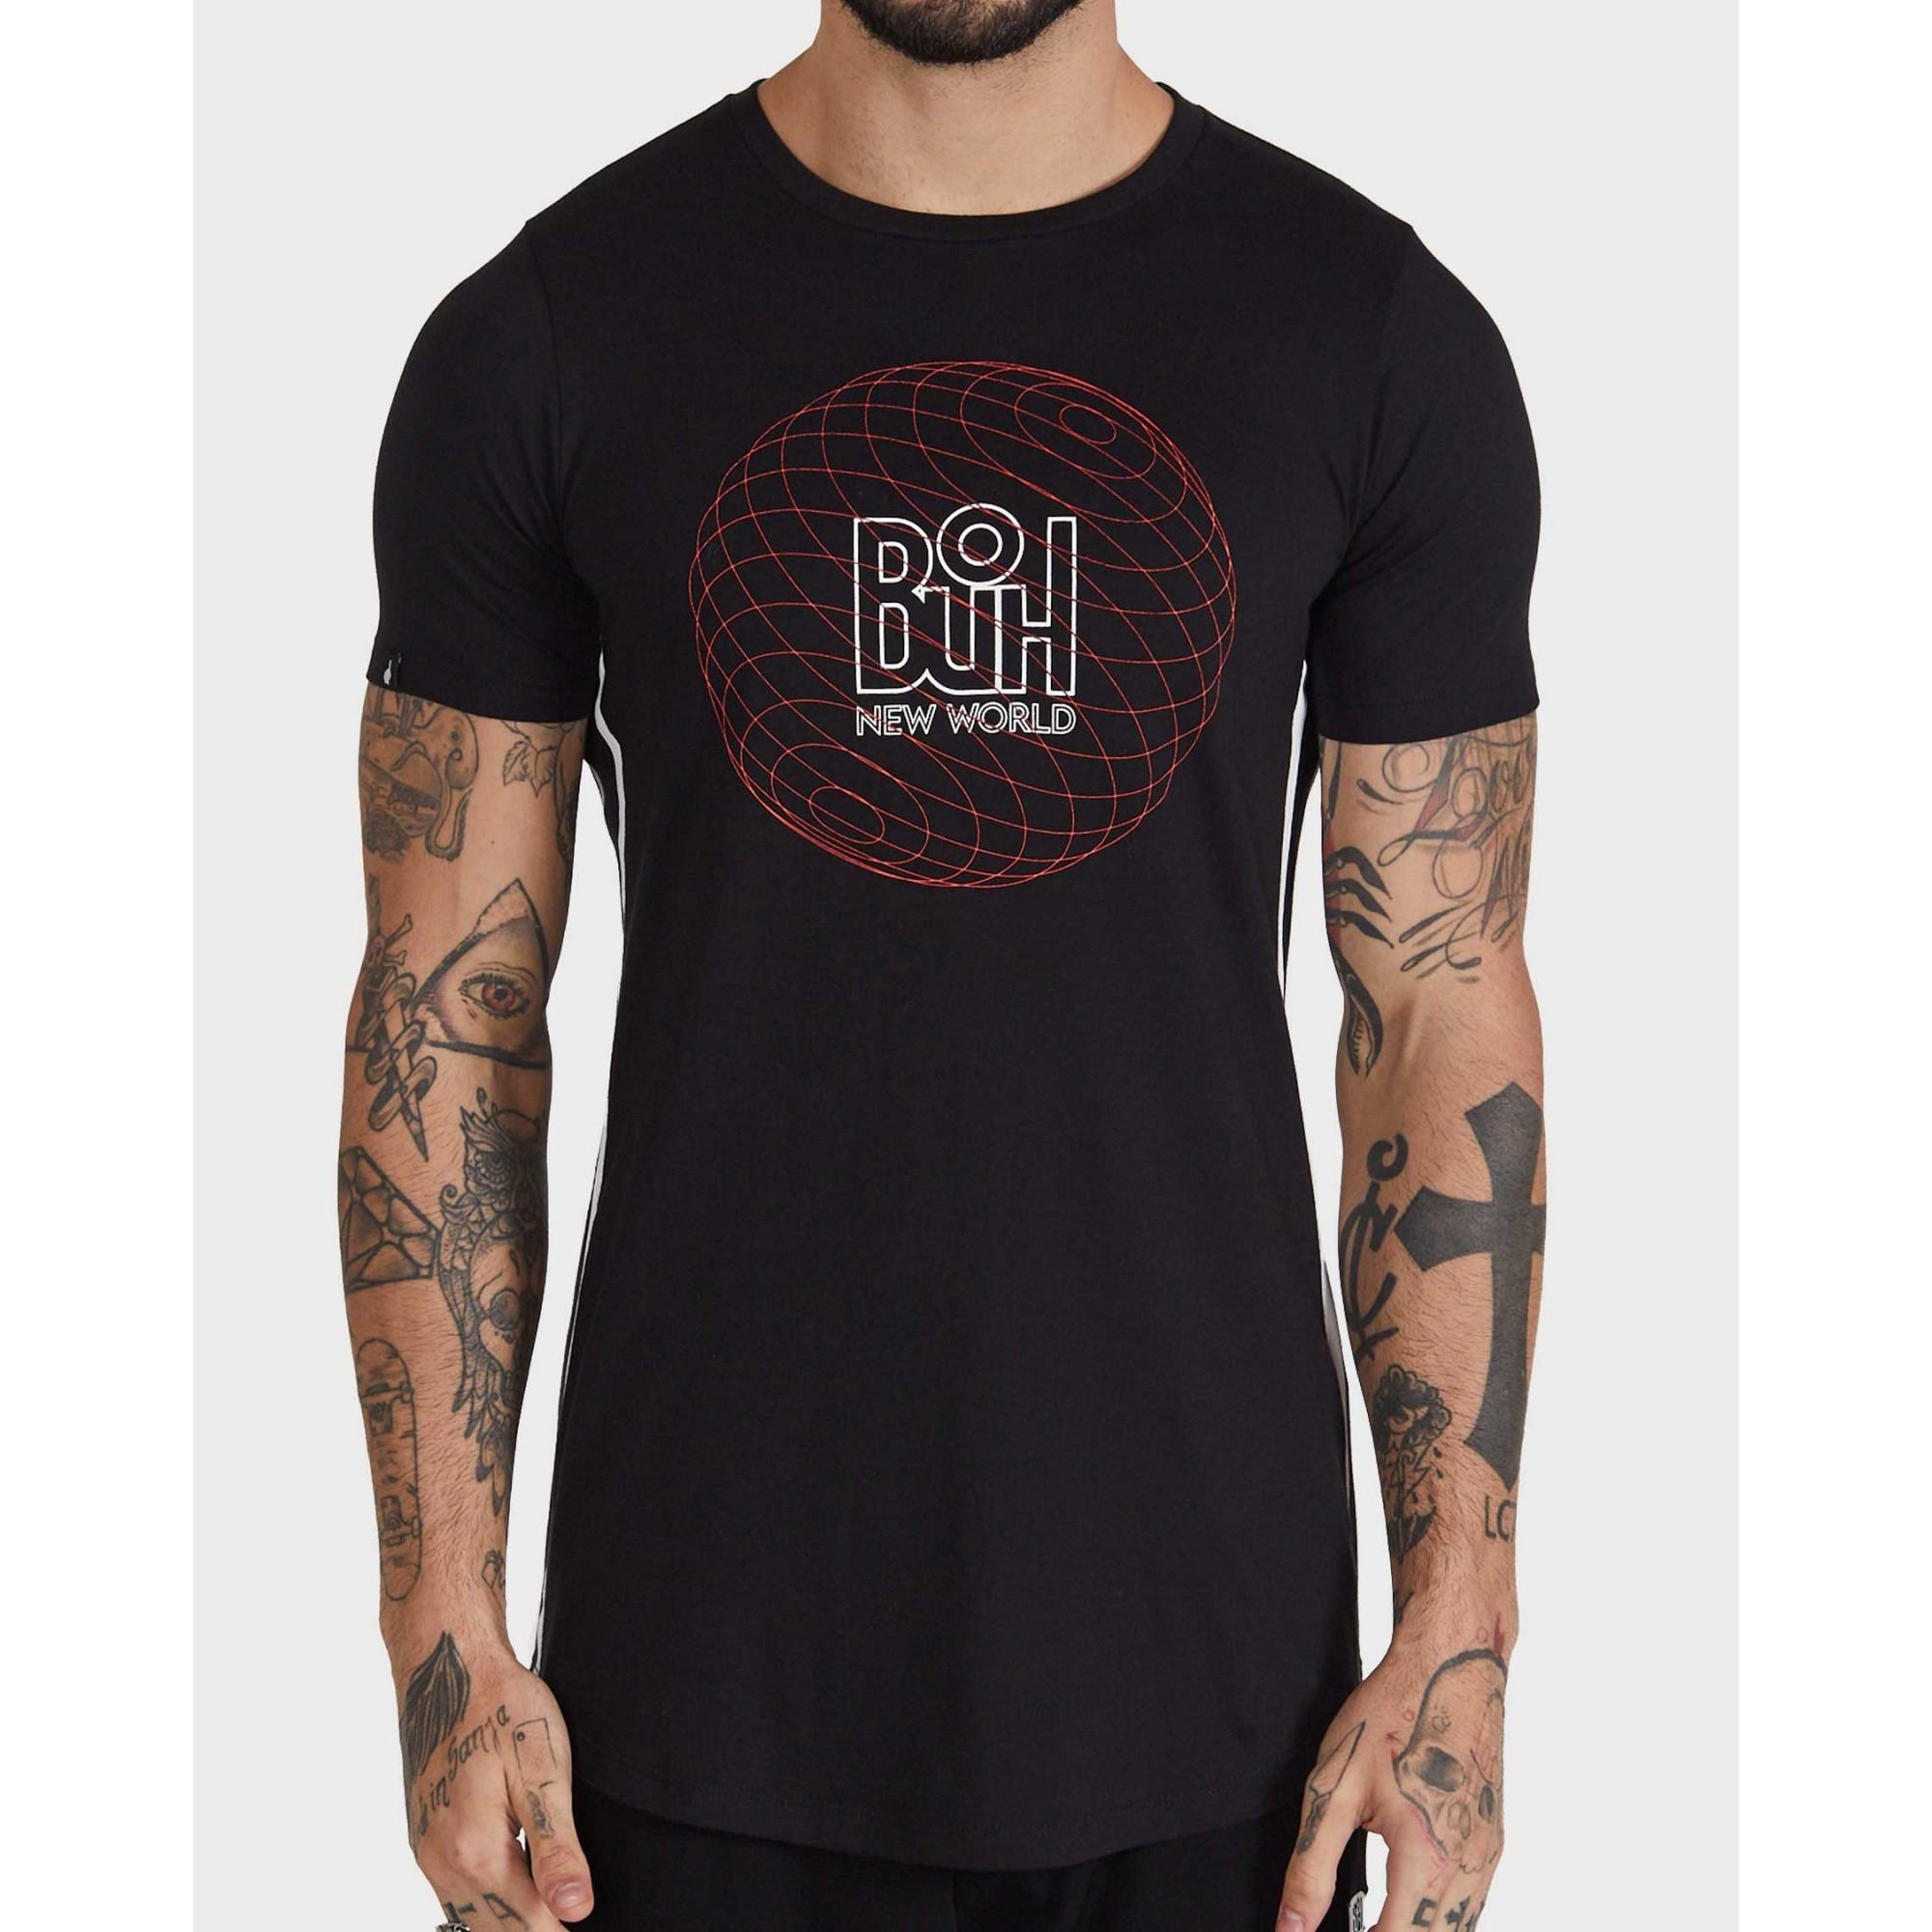 Camiseta Buh Round World Black